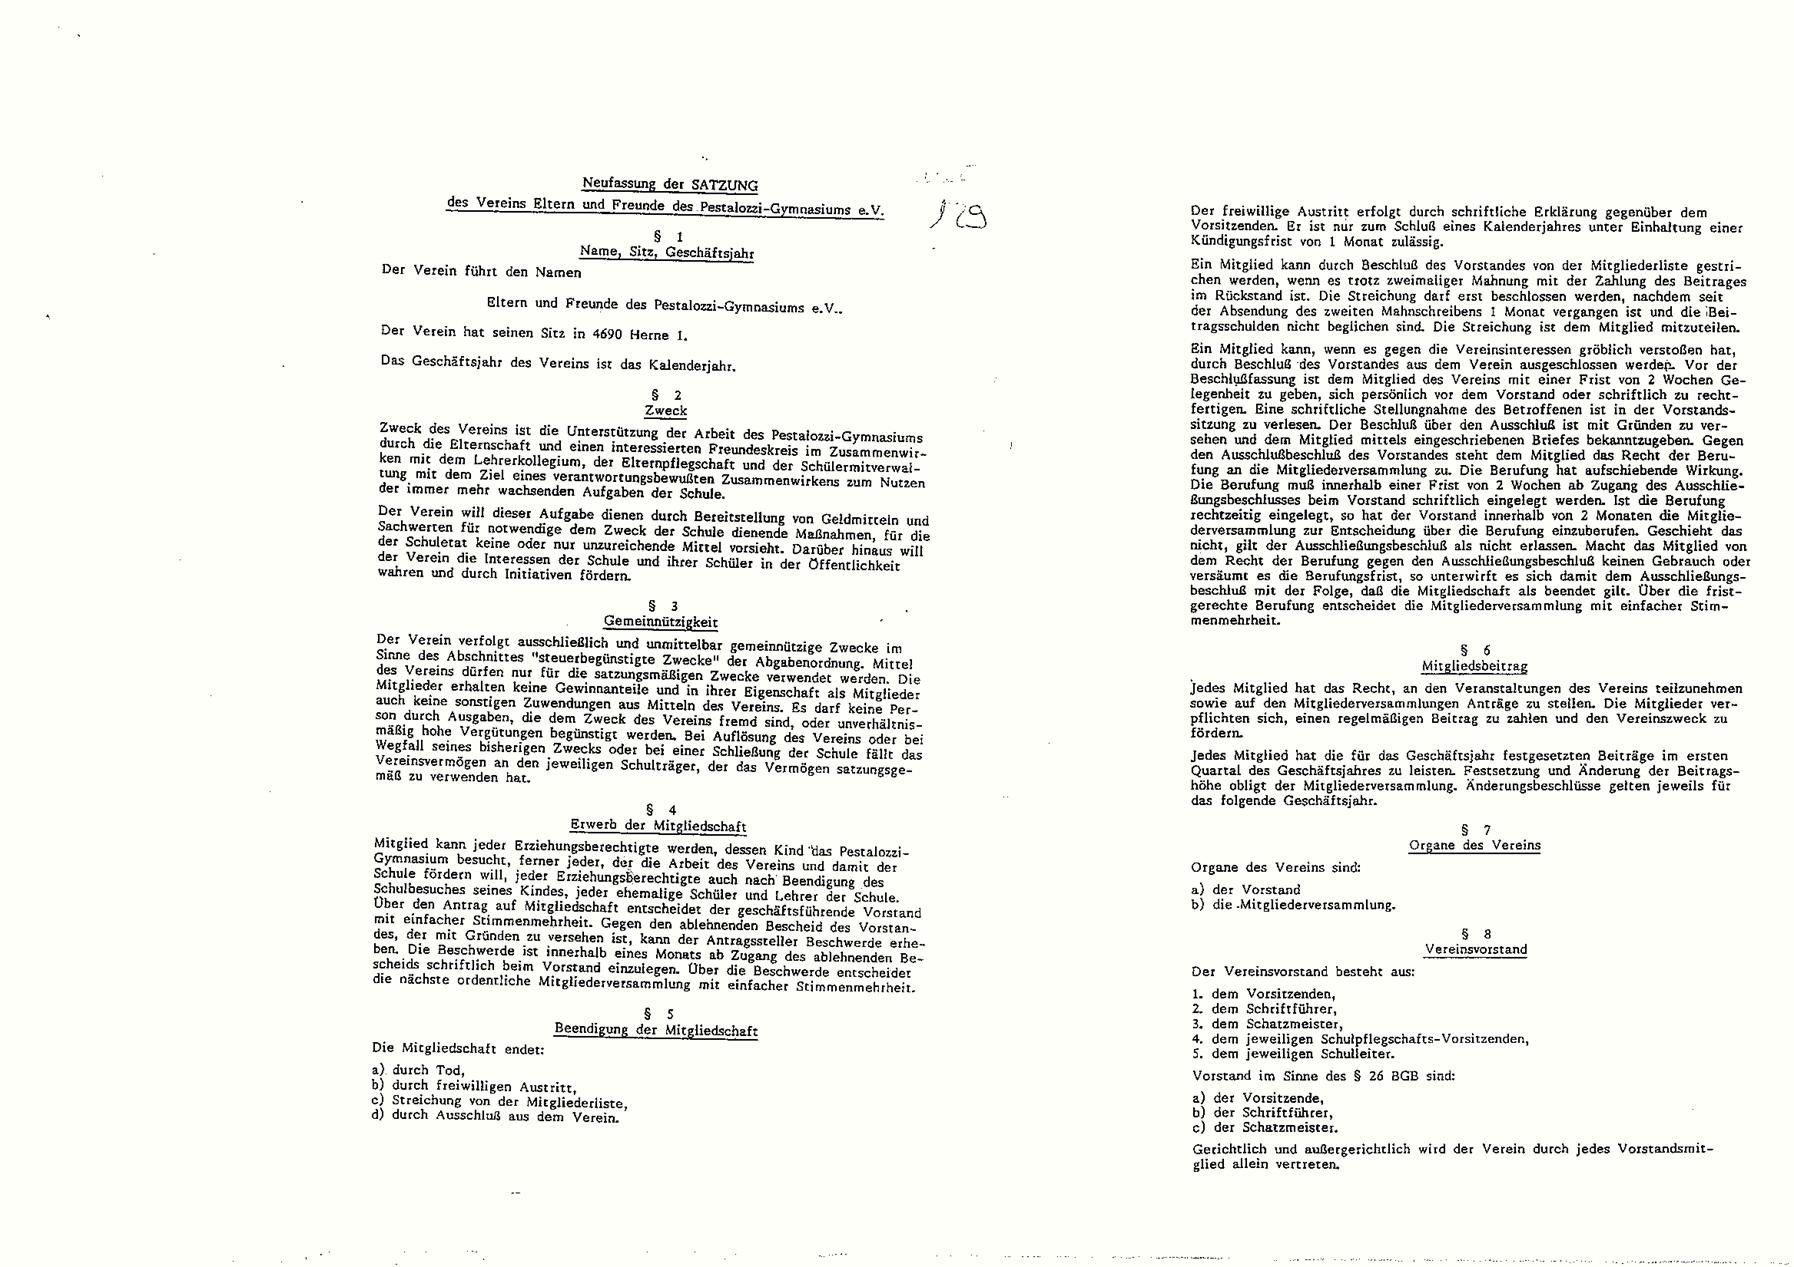 Förderverein Satzung 1